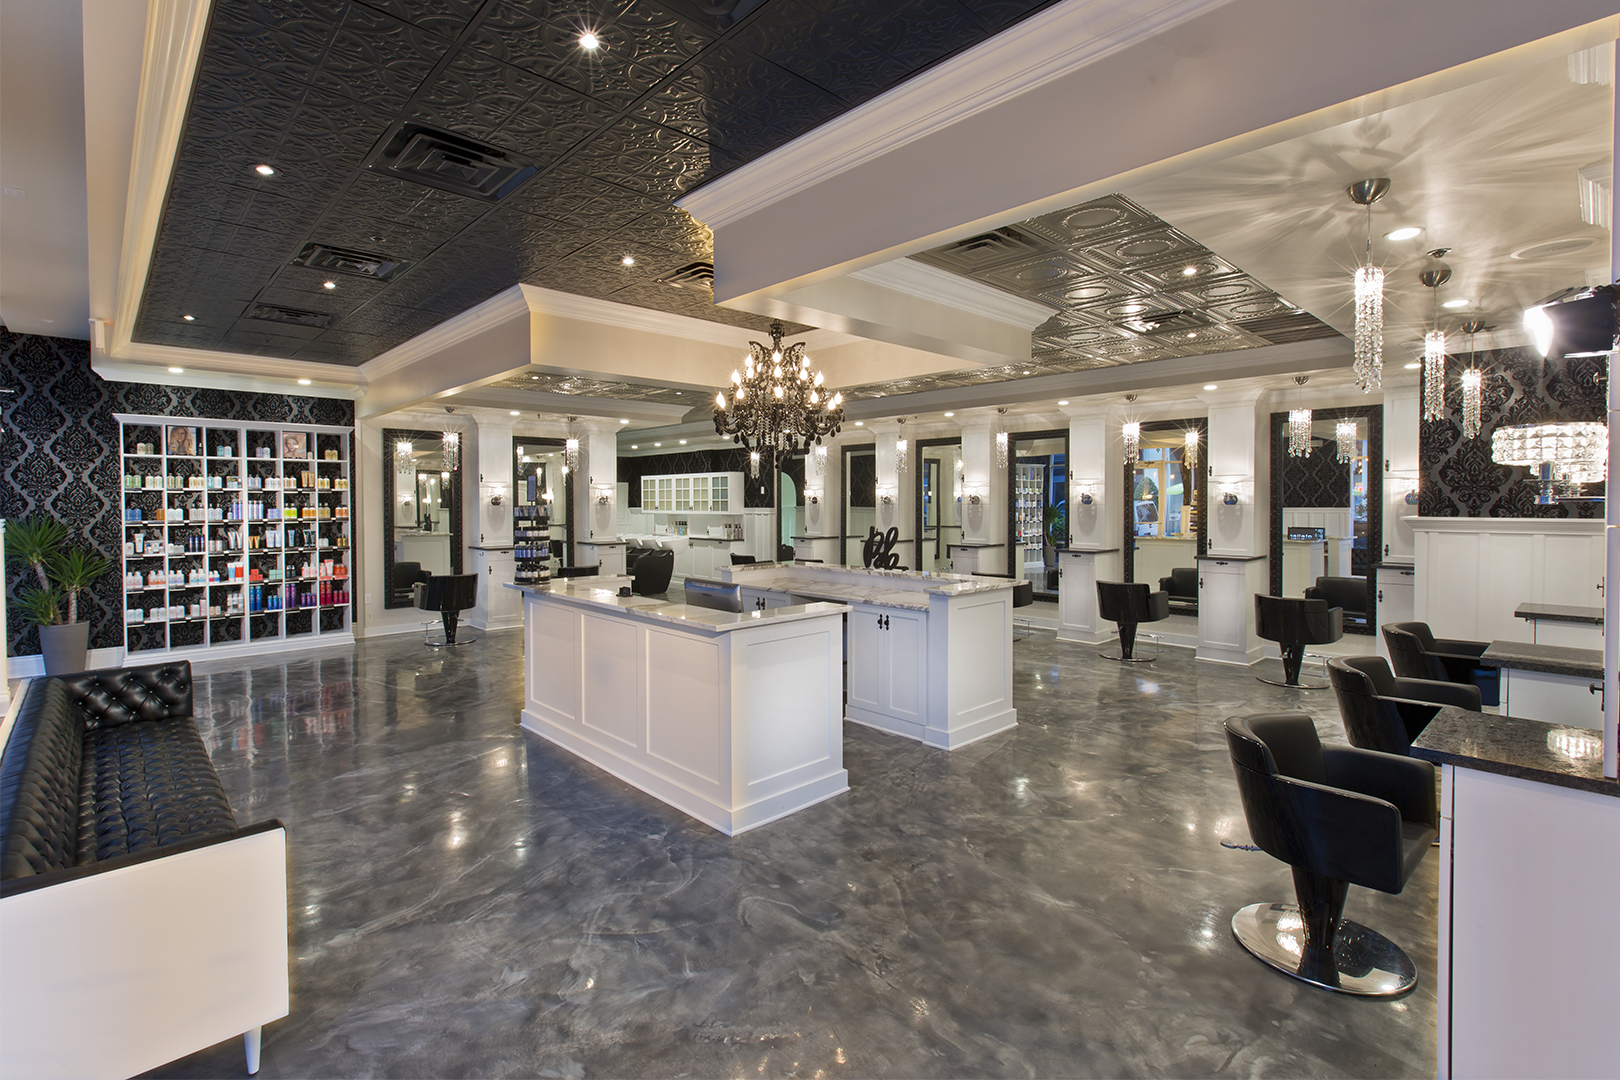 1920 hair salon design all home interior ideasatelier orlando, florida luxury hair salon1920 hair salon design 20